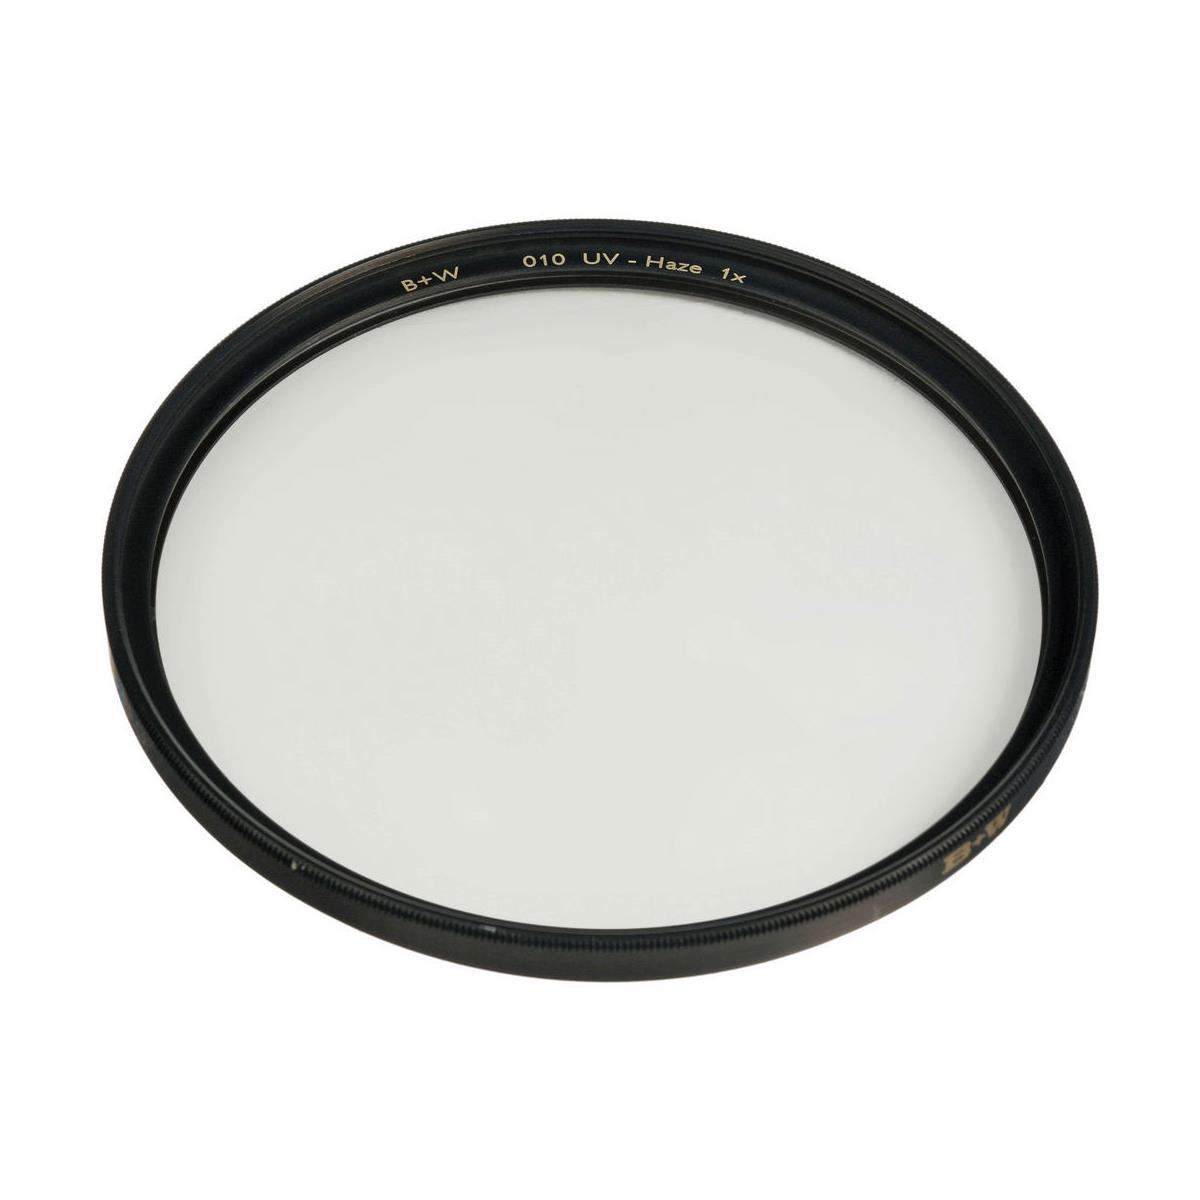 B+W 62MM UV Haze Coated Filter SC 010